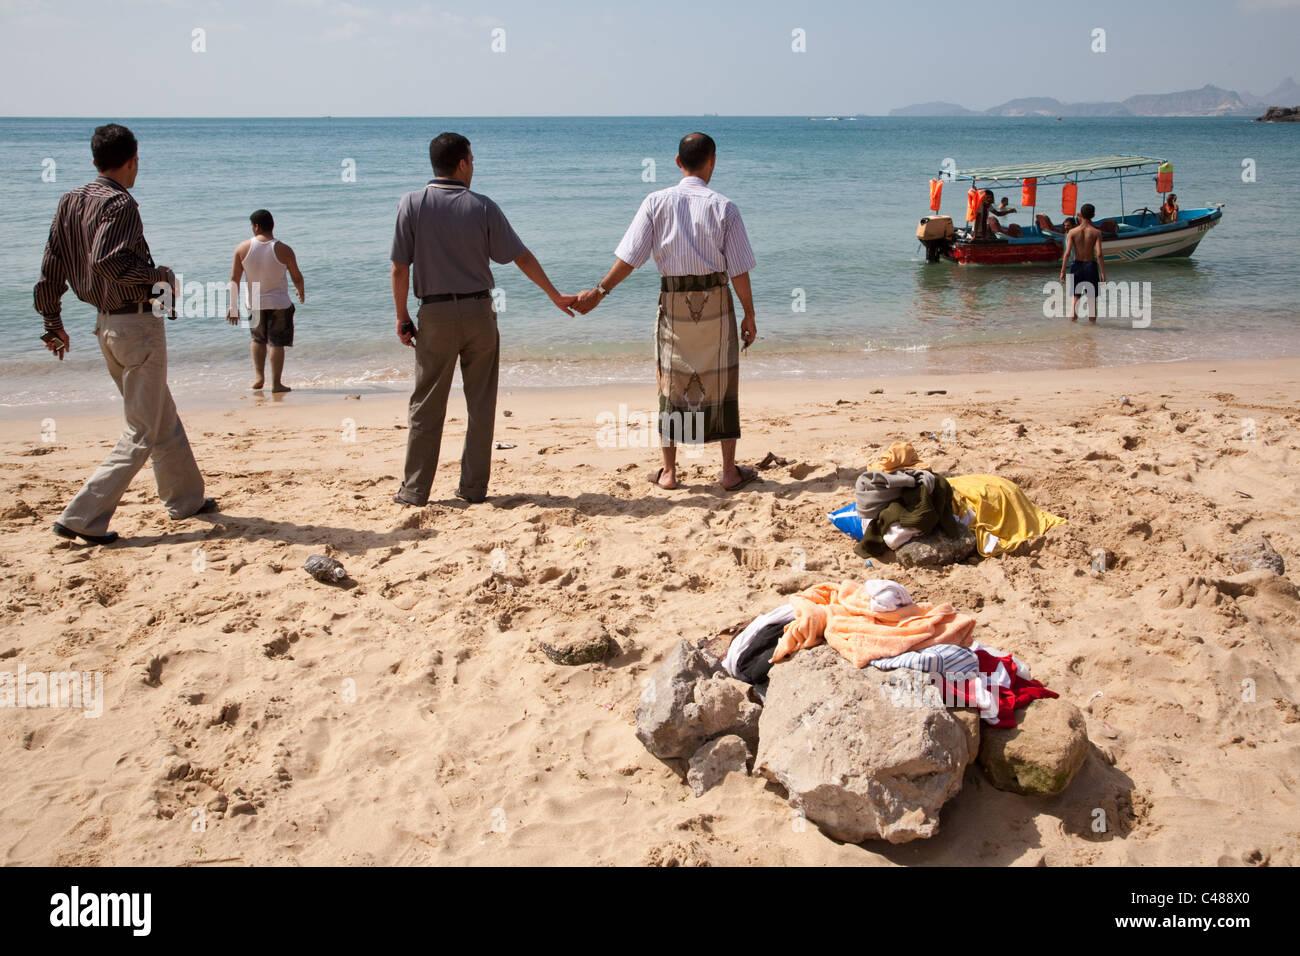 Yemeni men holding hands on the beach on the coast of Red Sea in Aden, Yemen. - Stock Image